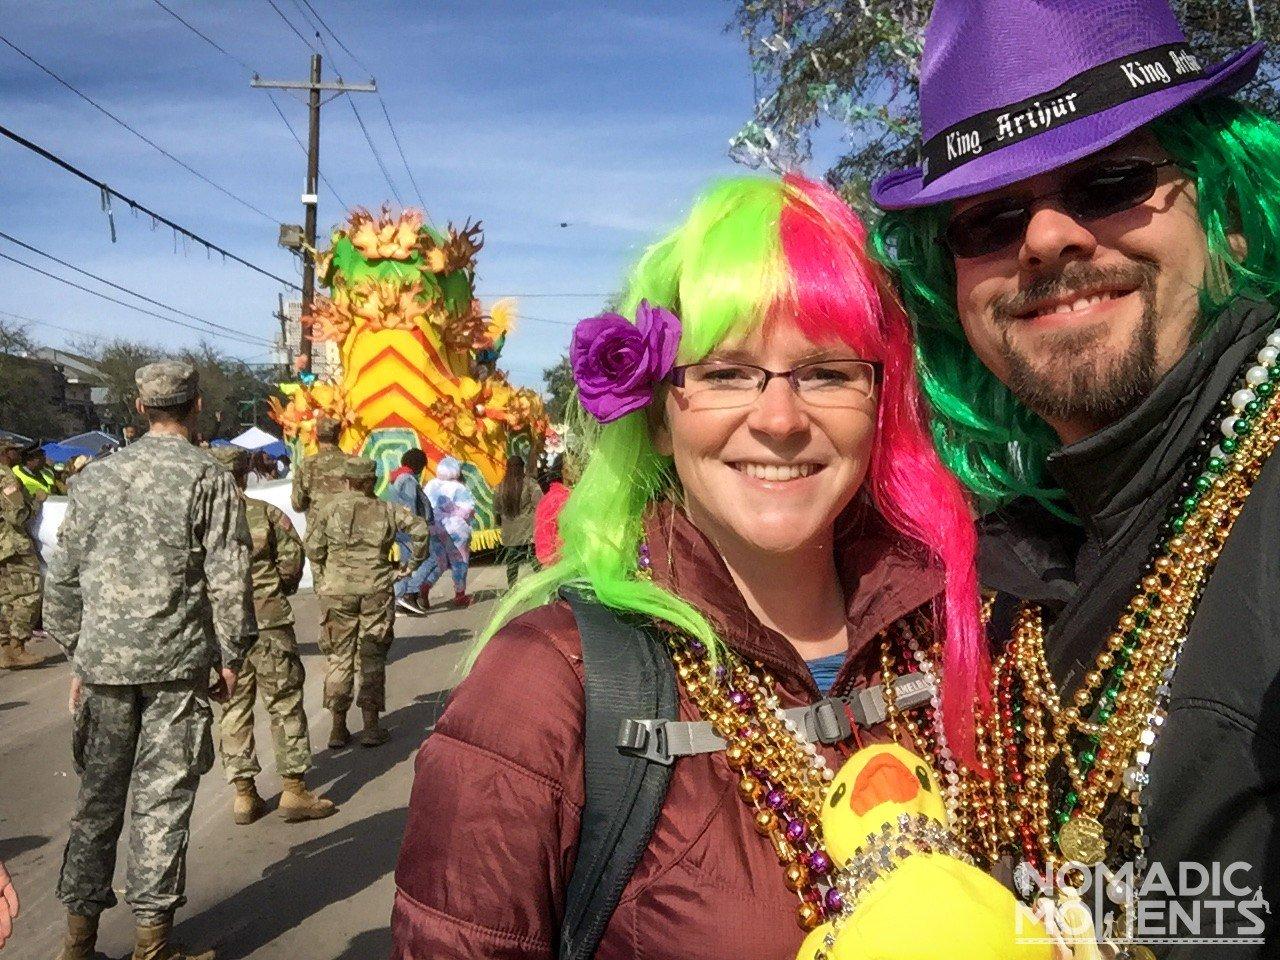 Mardi Gras NomadicMoments